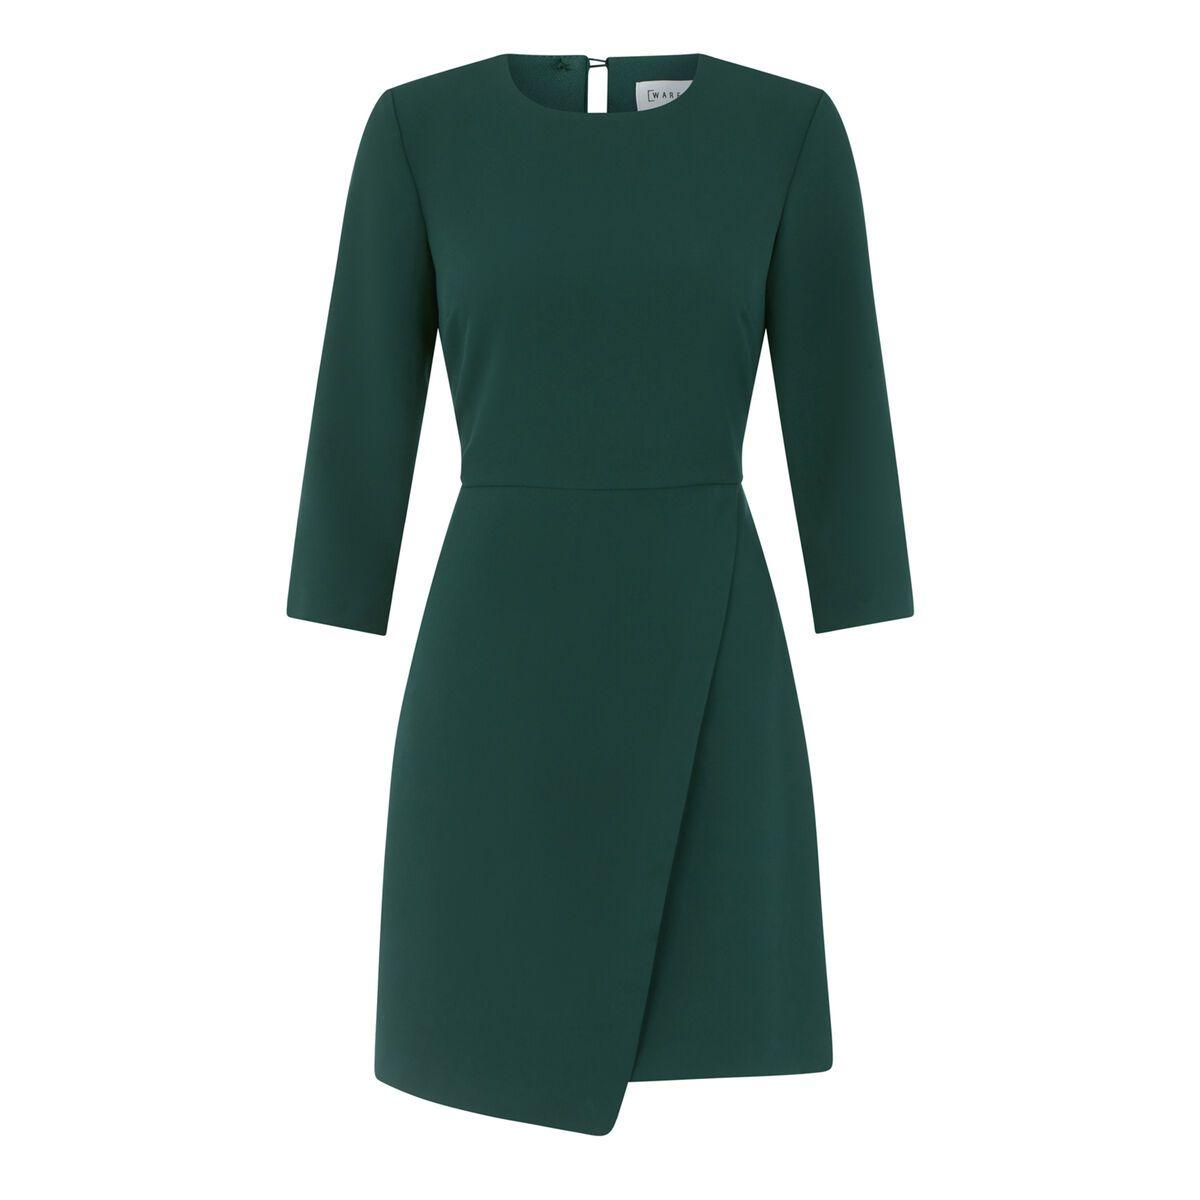 Warehouse 3 4 Sleeve Wrap Dress Dark Green 0 Wrap Dress Wrap Dress Midi Black Wrap Dress [ 1200 x 1200 Pixel ]